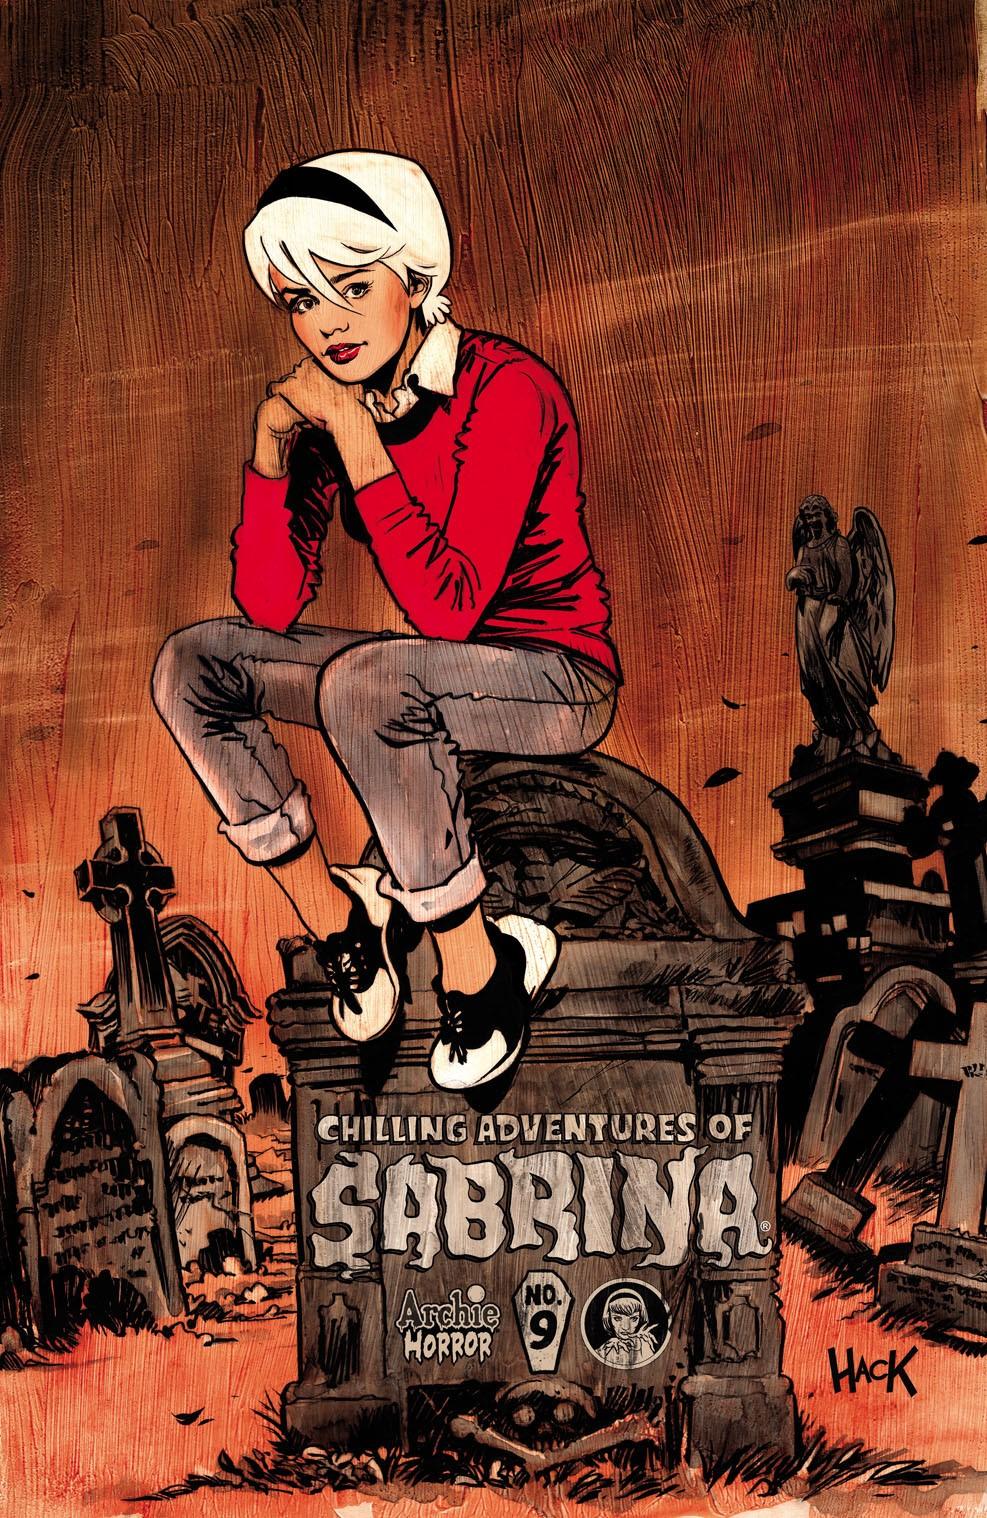 ChillingAdventuresOfSabrina_09_CoverB_Hack ComicList Previews: CHILLING ADVENTURES OF SABRINA #9